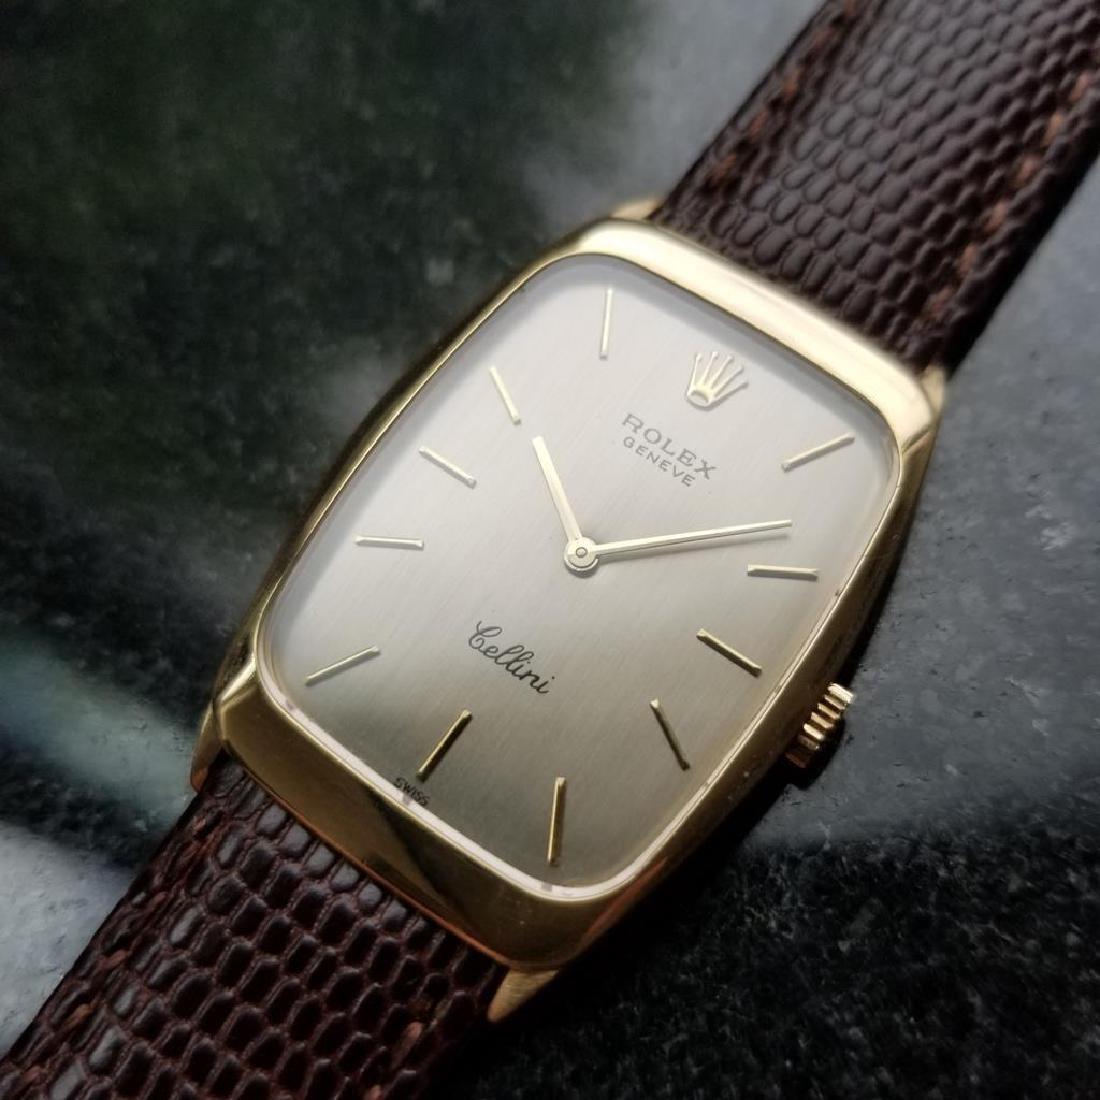 ROLEX Men's 18K Gold Cellini 4136 Hand-Wind Dress Watch